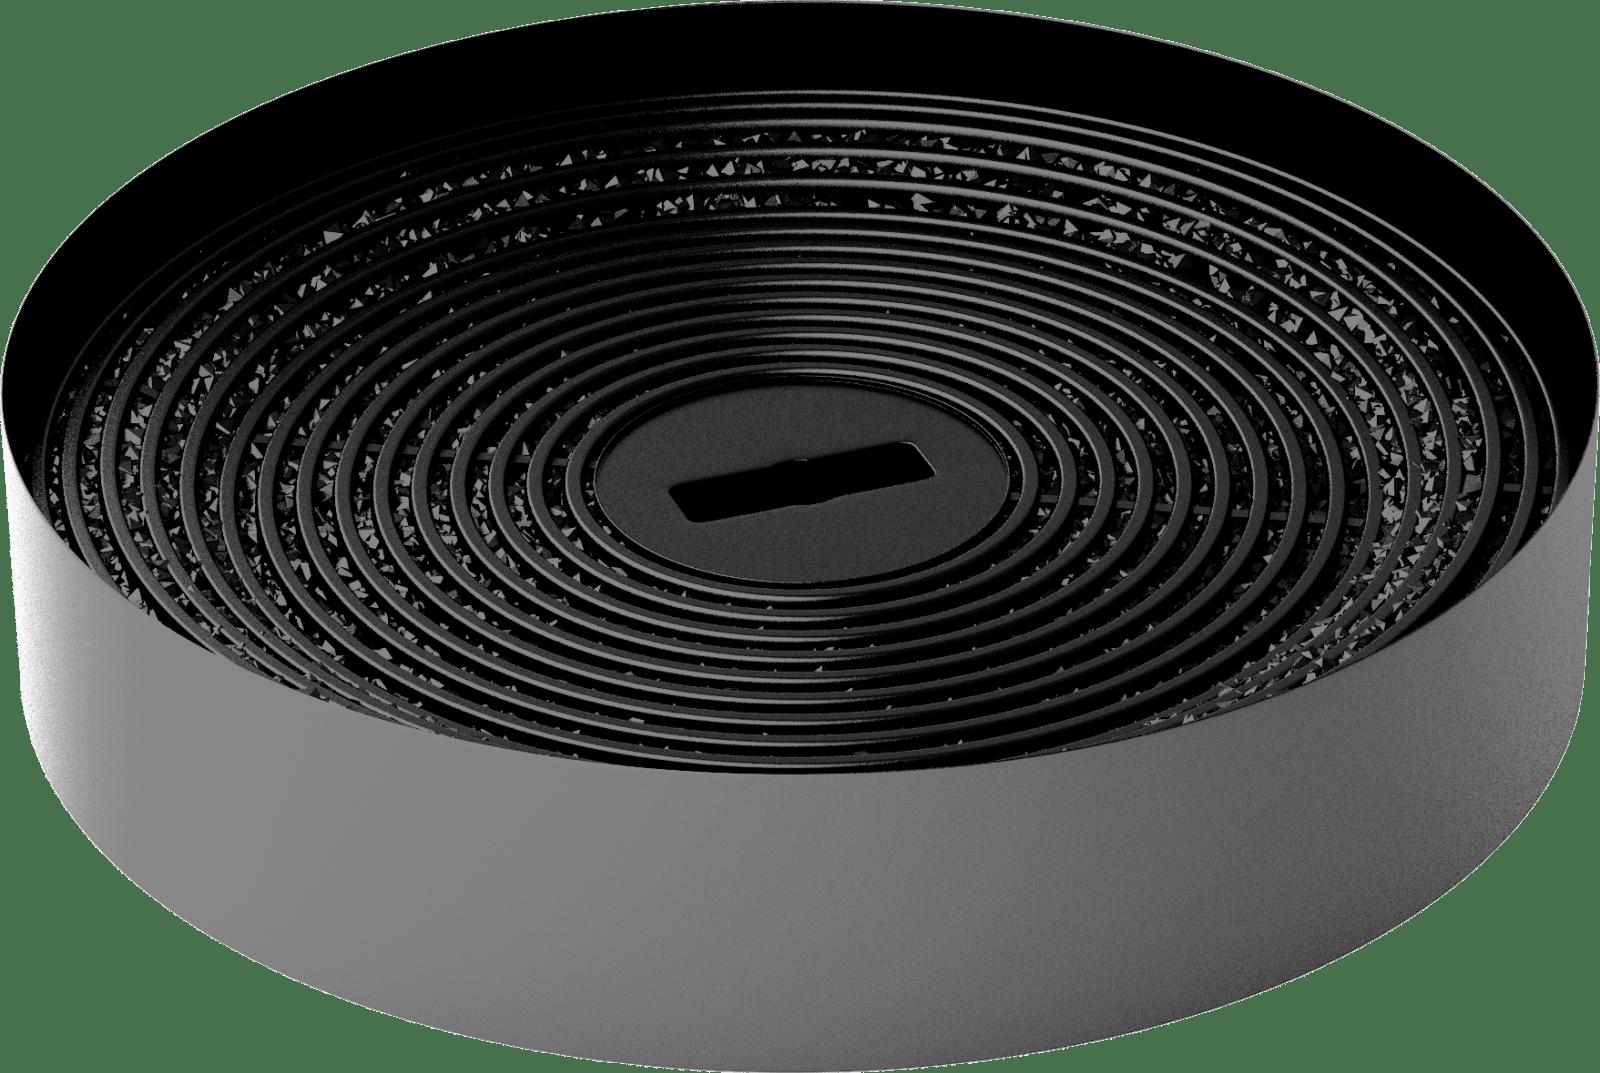 Kohlefilter dunstabzugshaube lebensdauer dunstabzugshaube test